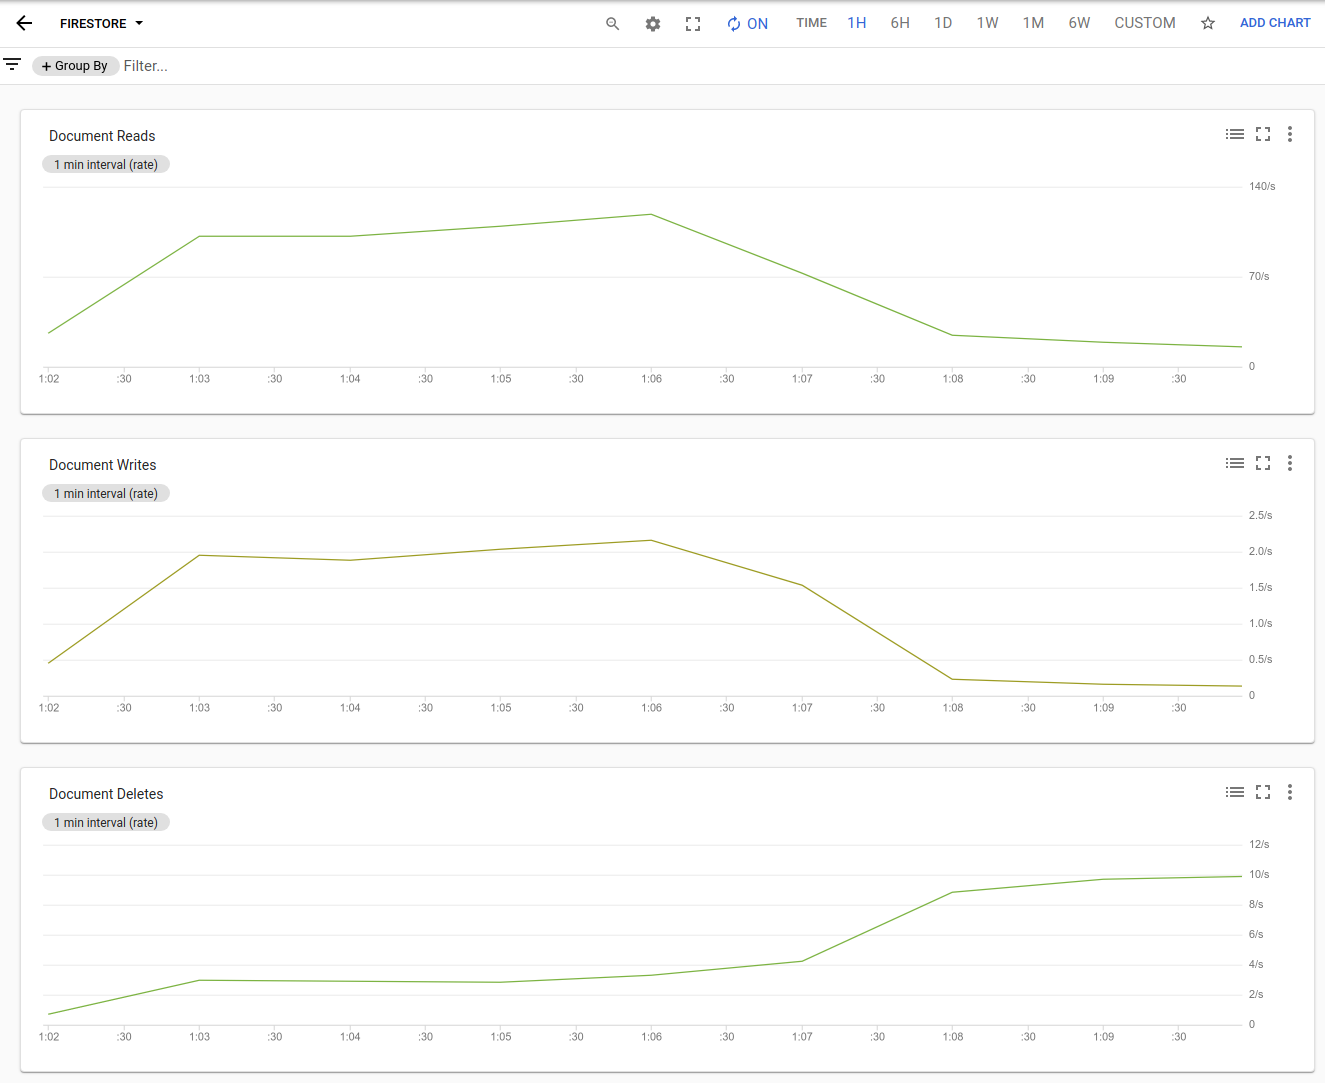 Firestore usage in a Cloud Monitoring dashboard.